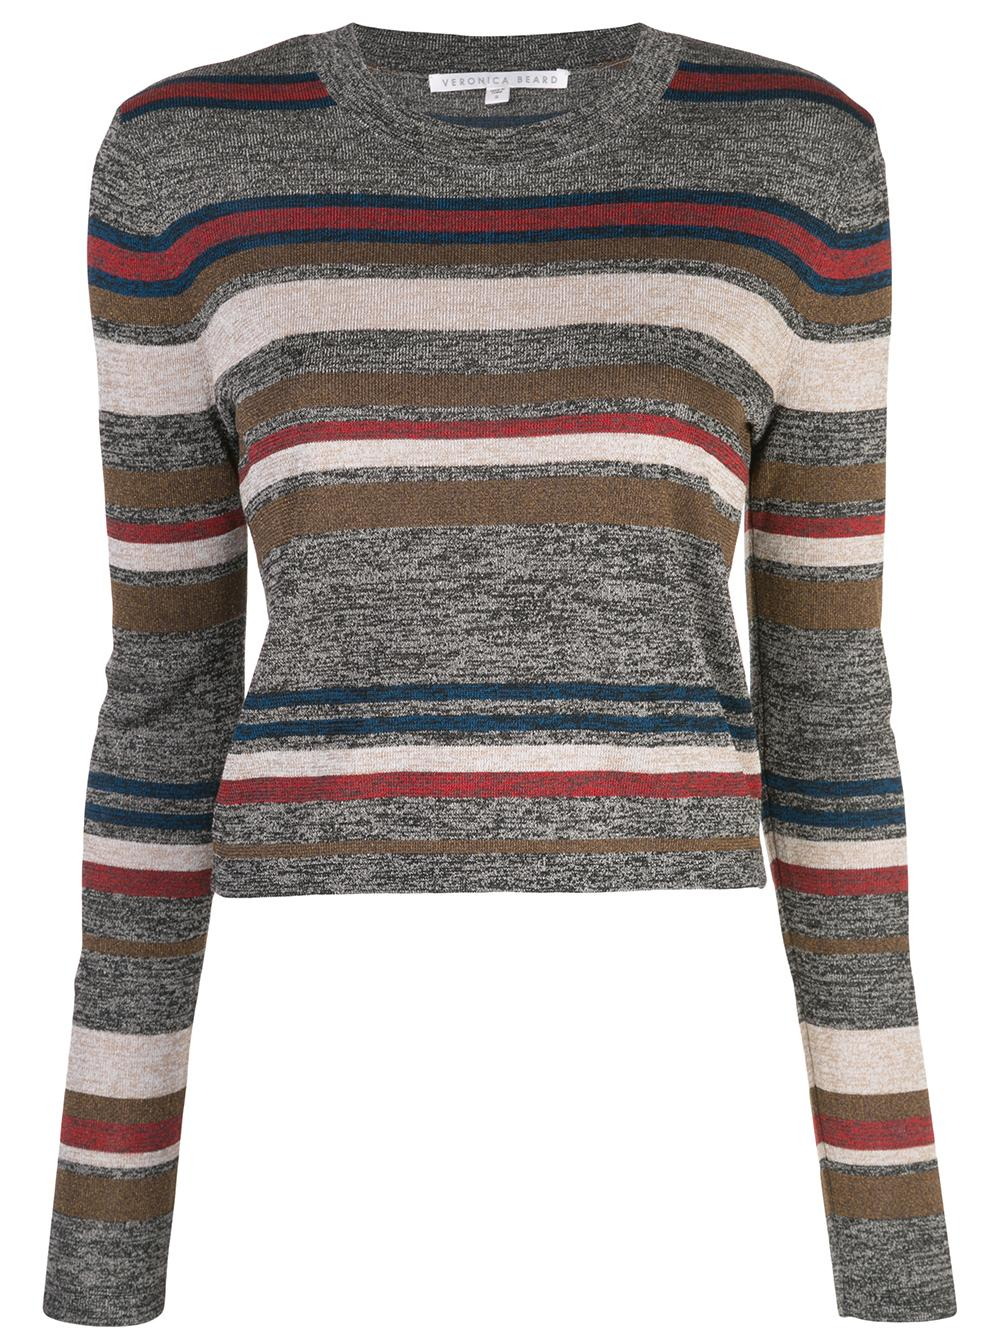 Jora Striped Knit Pullover Top Item # 1907KN4639314